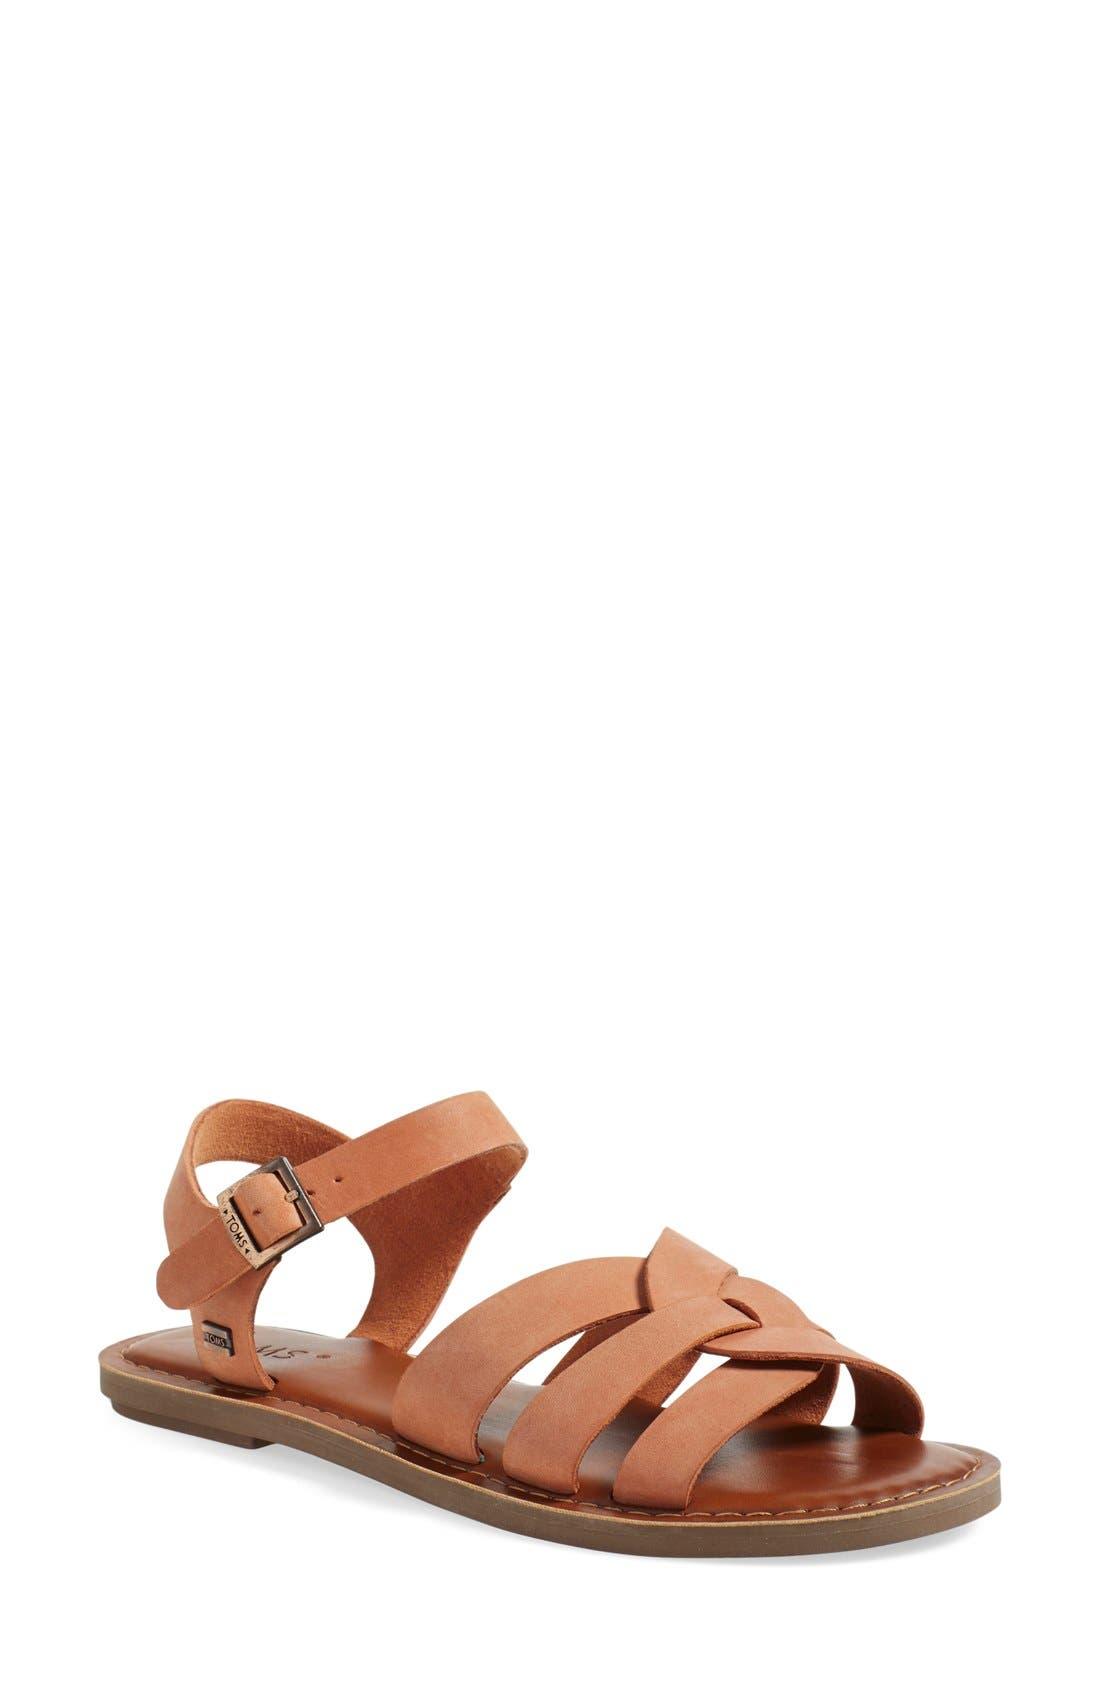 Alternate Image 1 Selected - TOMS 'Zoe' Flat Quarter Strap Sandal (Women)